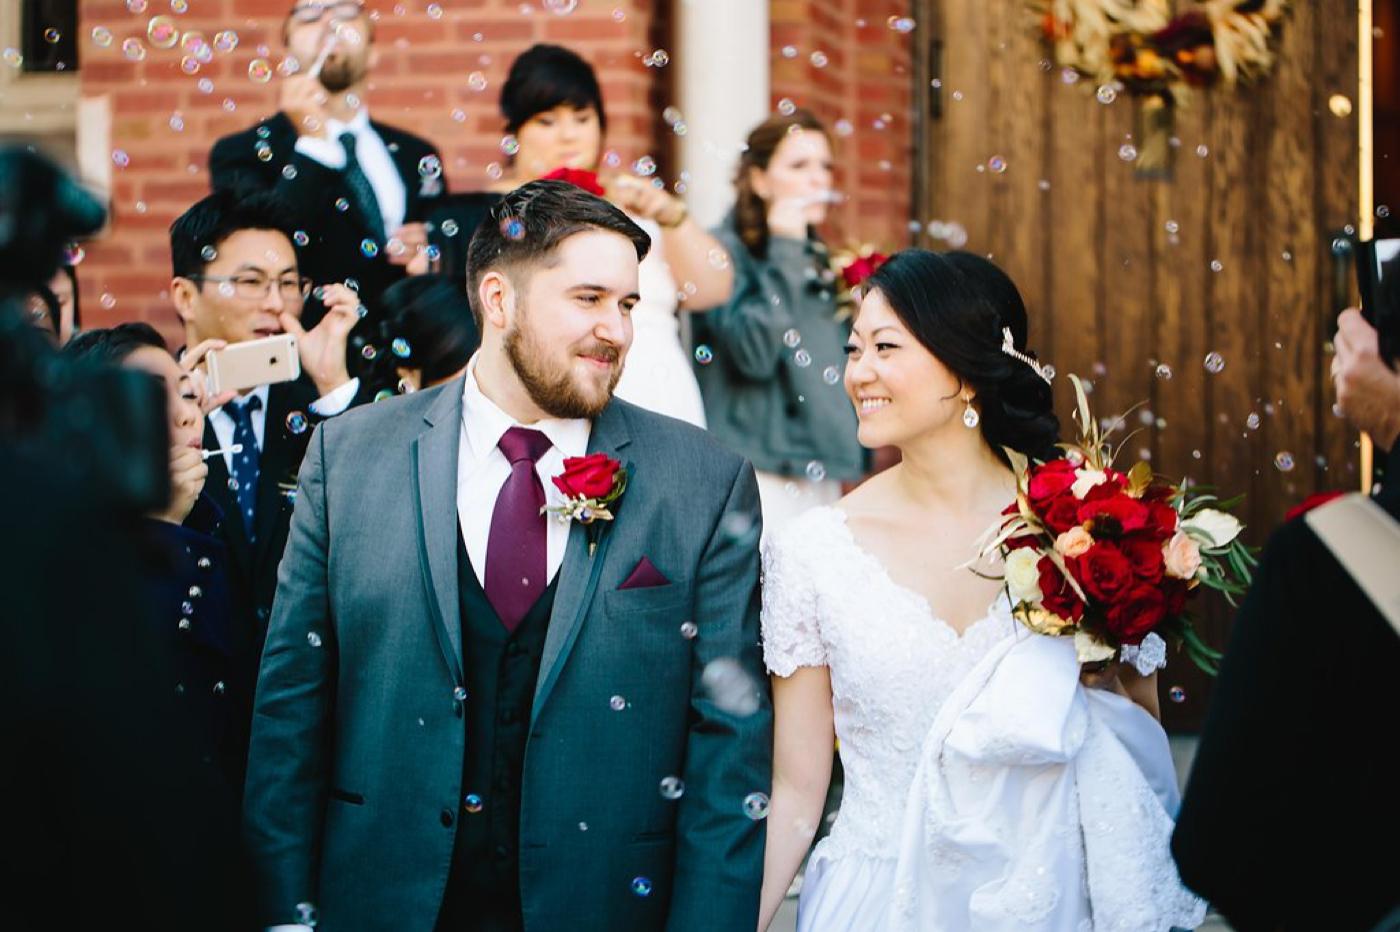 chicago-fine-art-wedding-photography-bolotin28